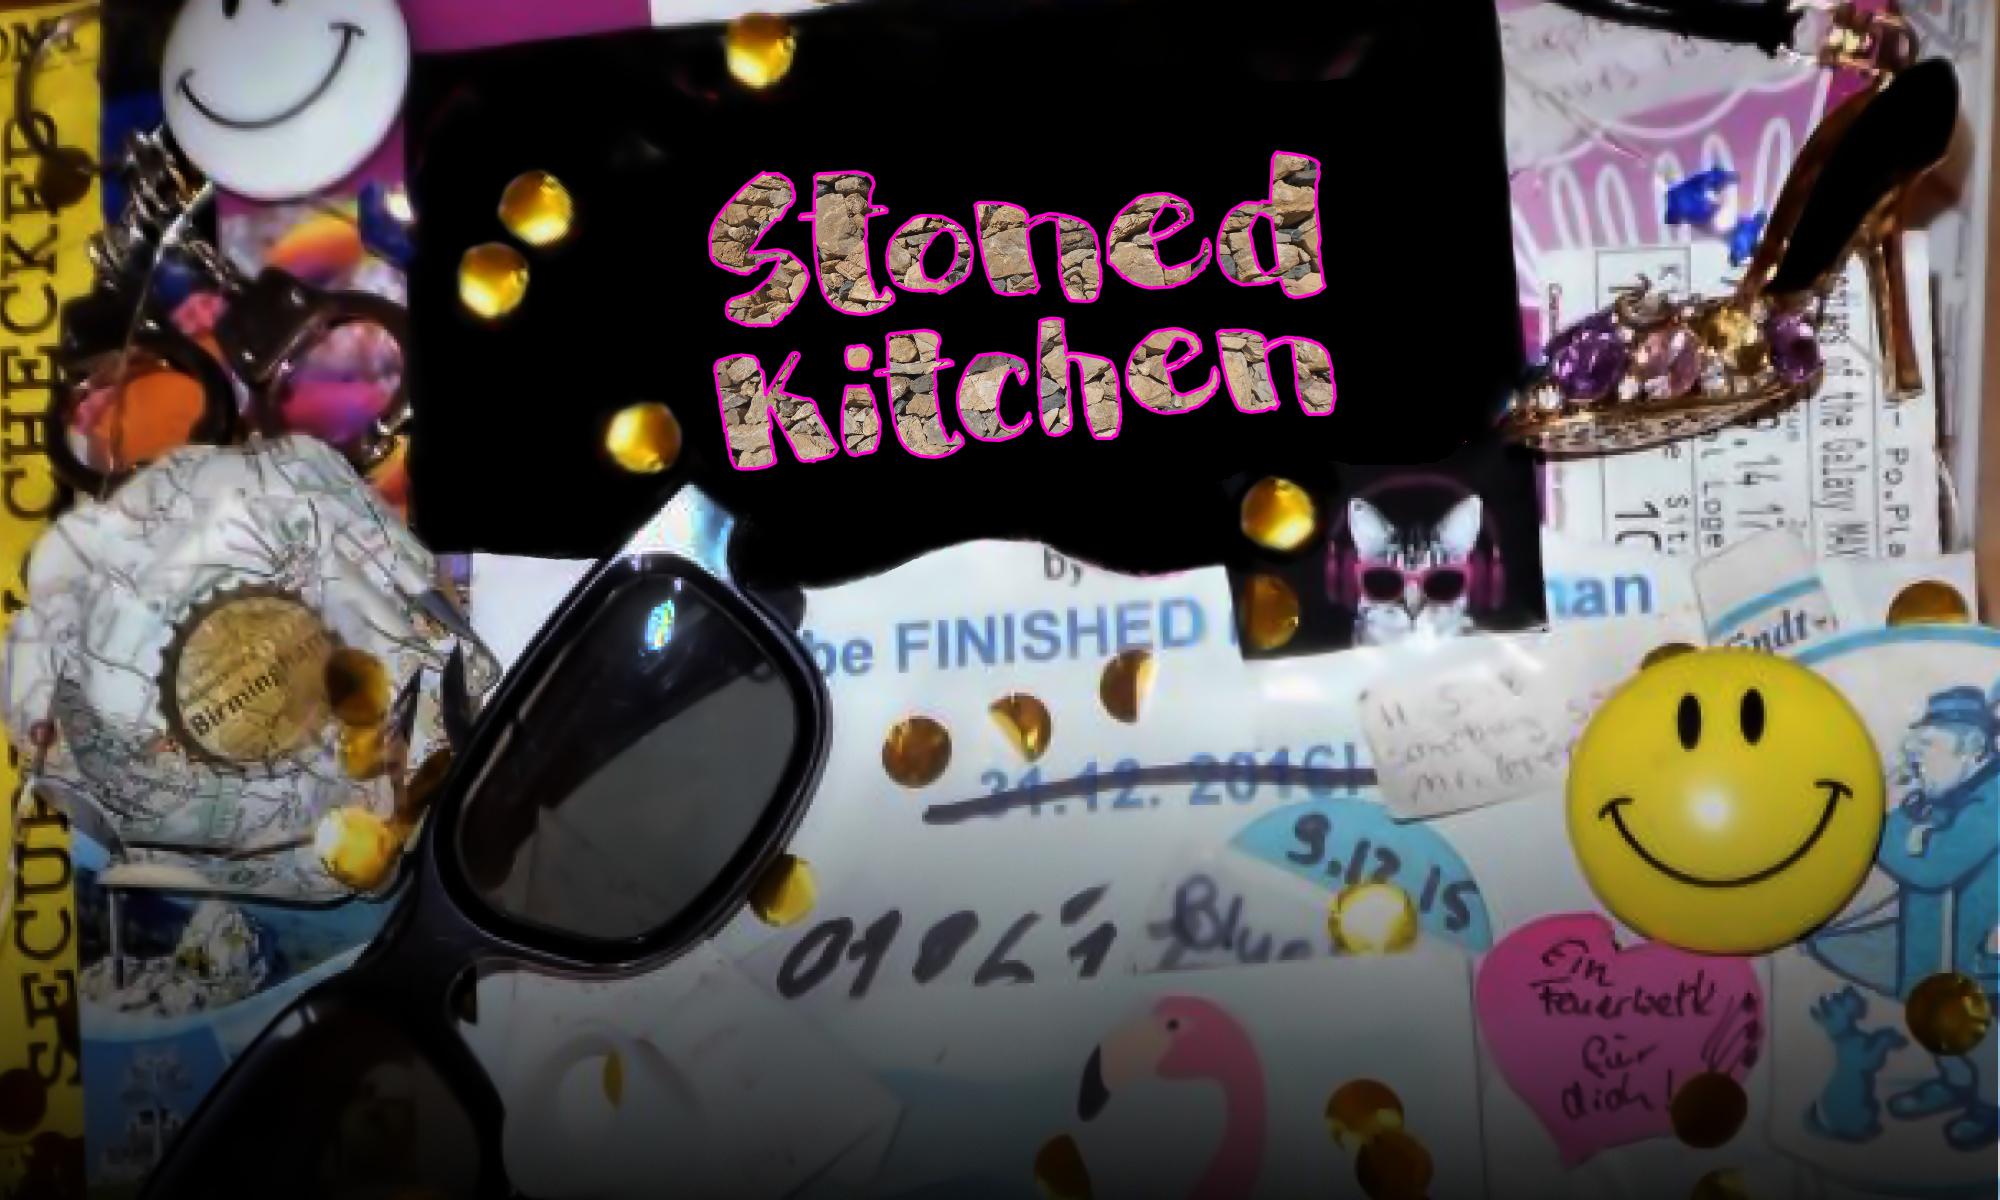 Stoned Kitchen